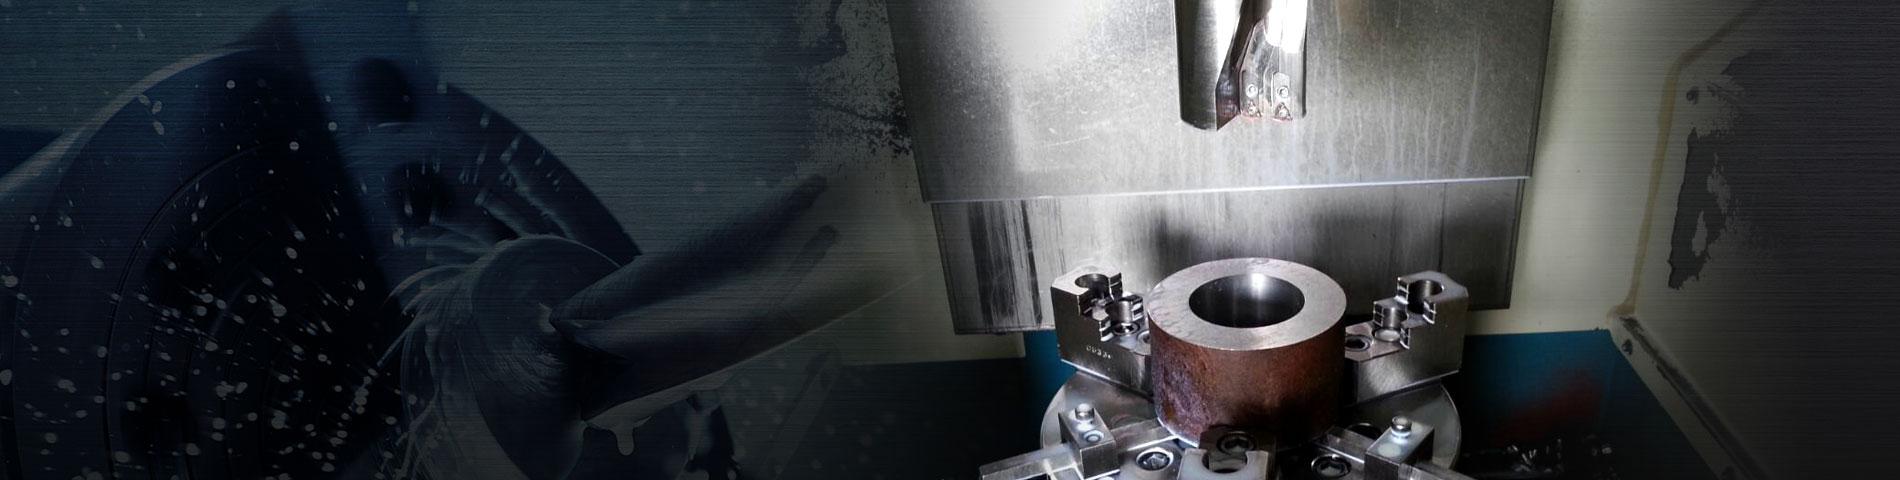 Drilling Service 高速鑽孔服務